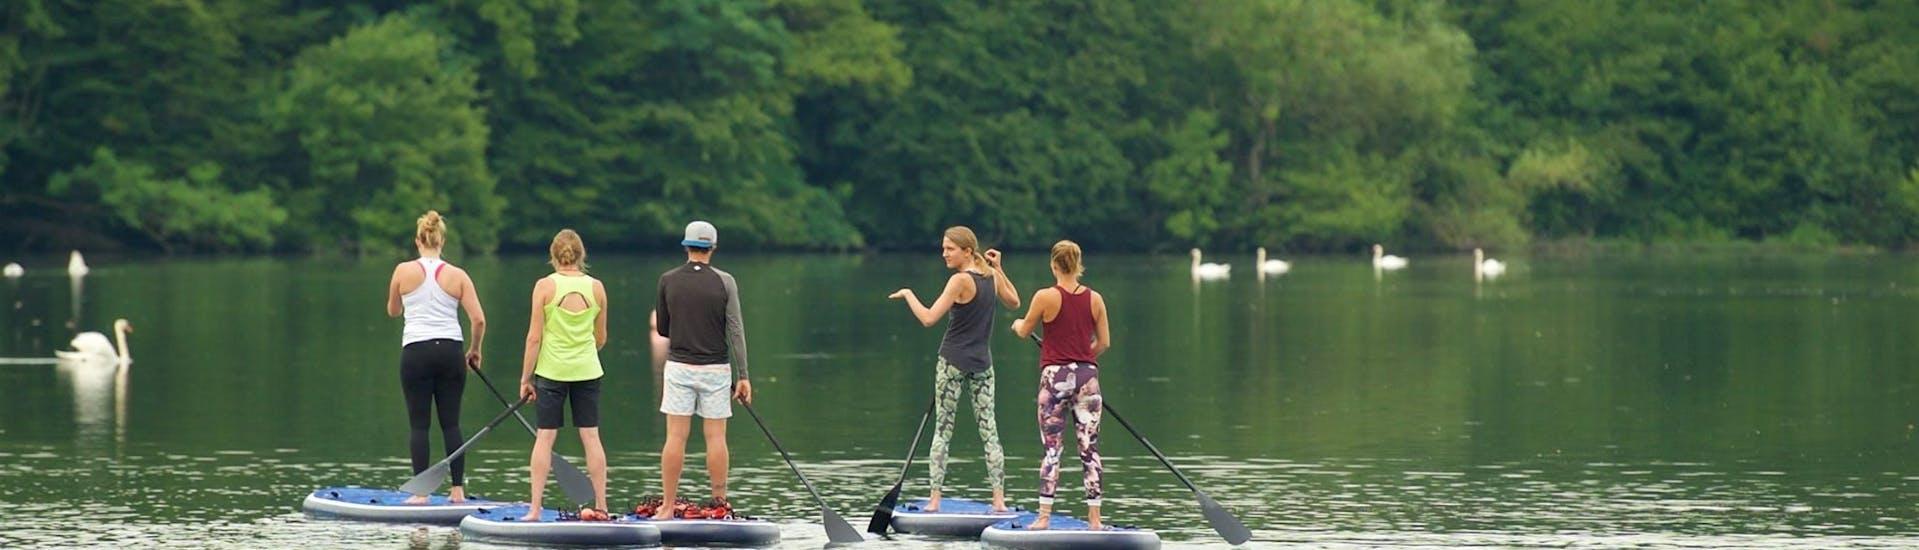 "SUP Tour ""Action"" - Rhine"